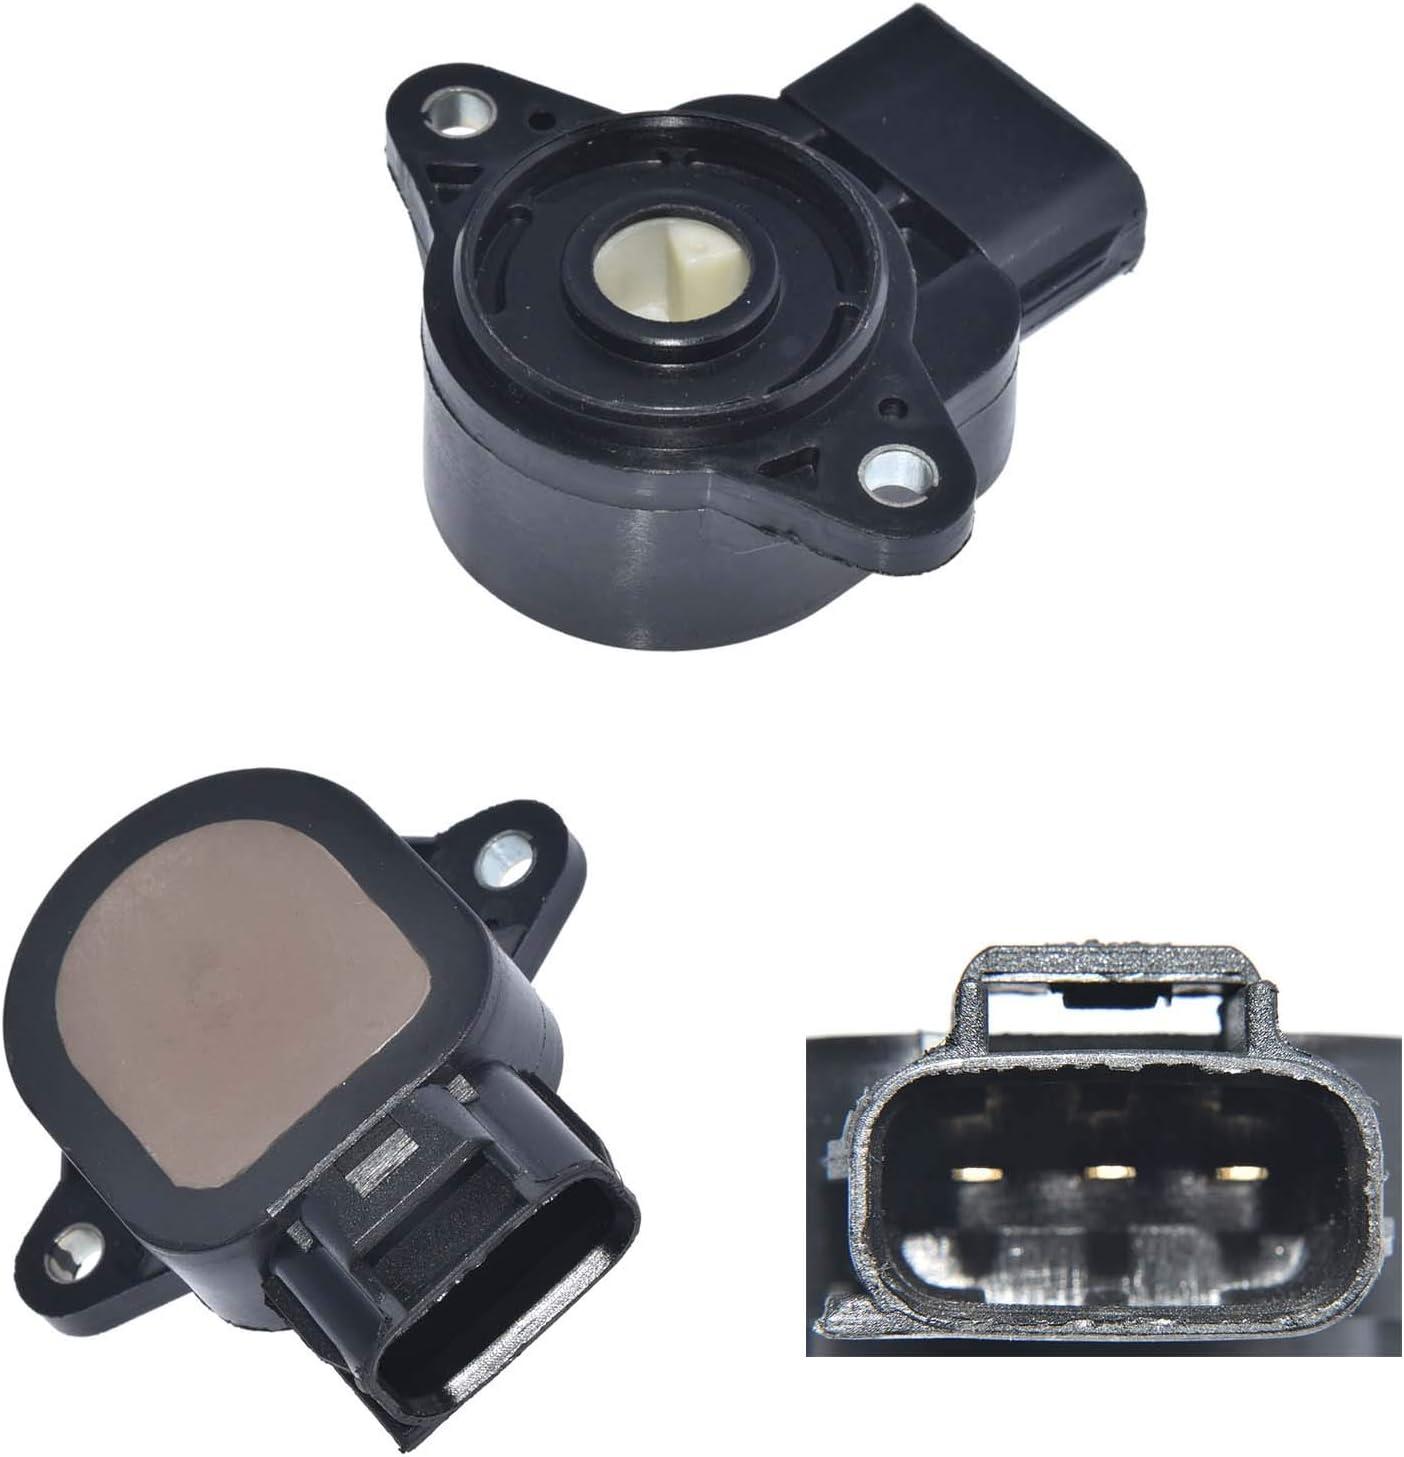 throttle body position control TPS sensor fits 96-00 4Runner 06-07 Hiace 05-06 Hilux 03-06 Matrix 03-06 Vibe L4 1.8L 2.4L 2.7L V6 3.4L 97-02 Tacoma 05 Corolla